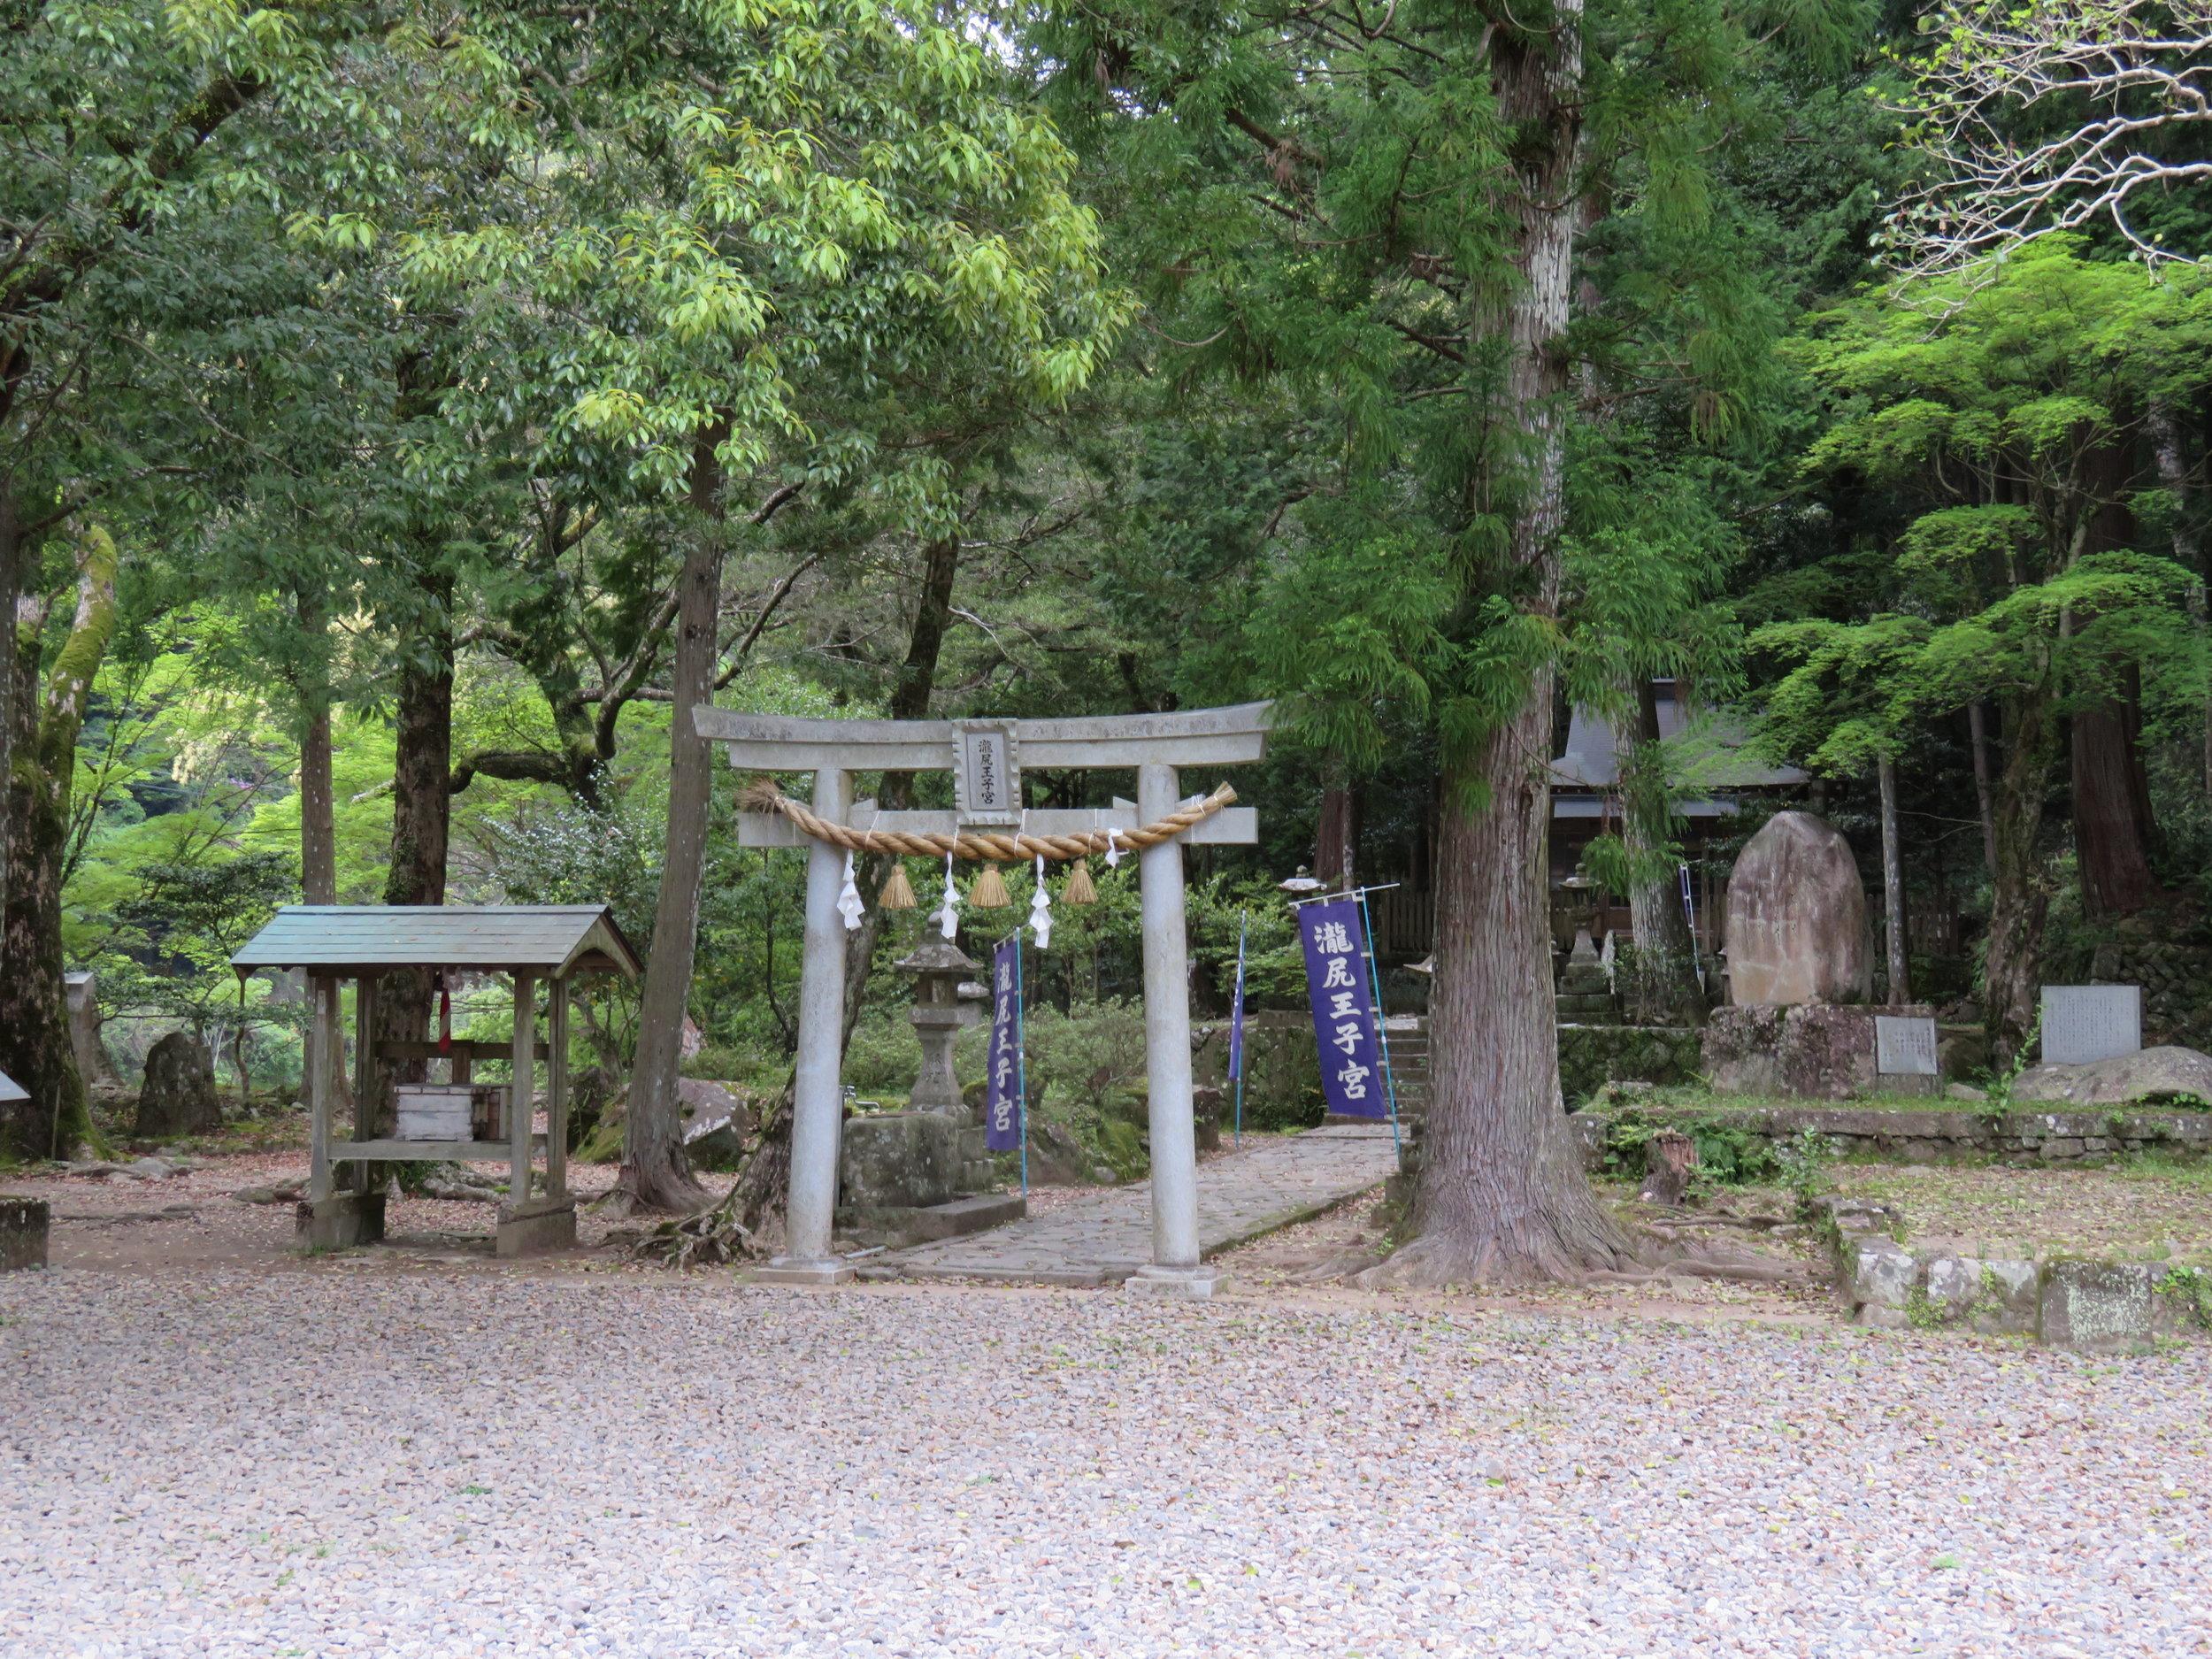 The start of the Kumano Kodo at Takijiri